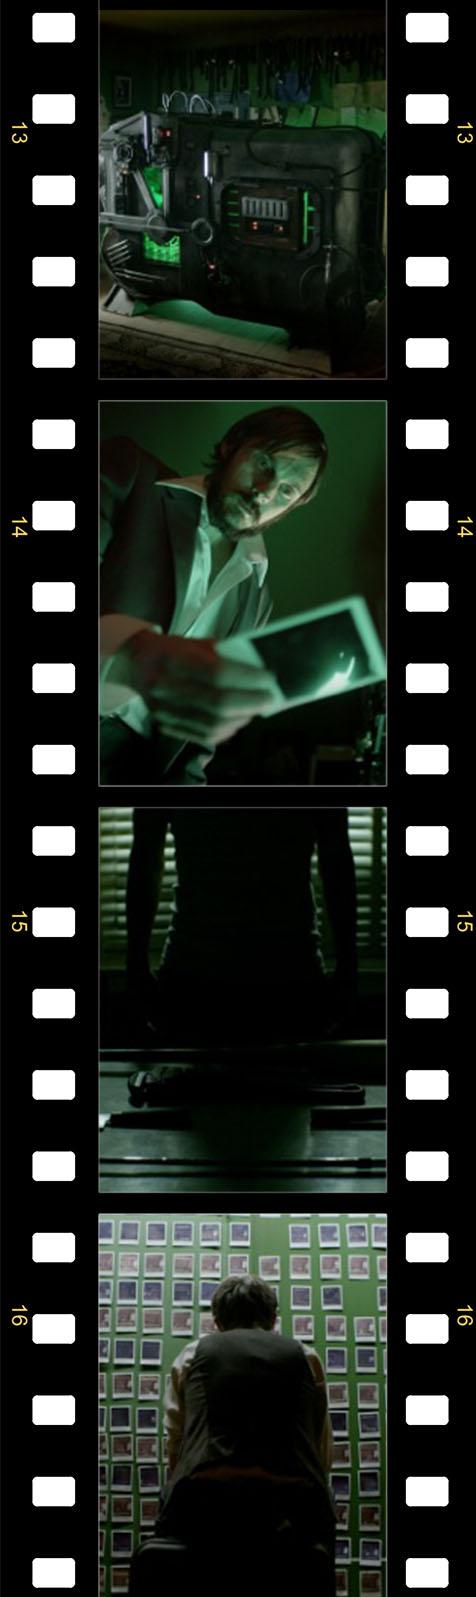 Time lapse_juniper-film strip